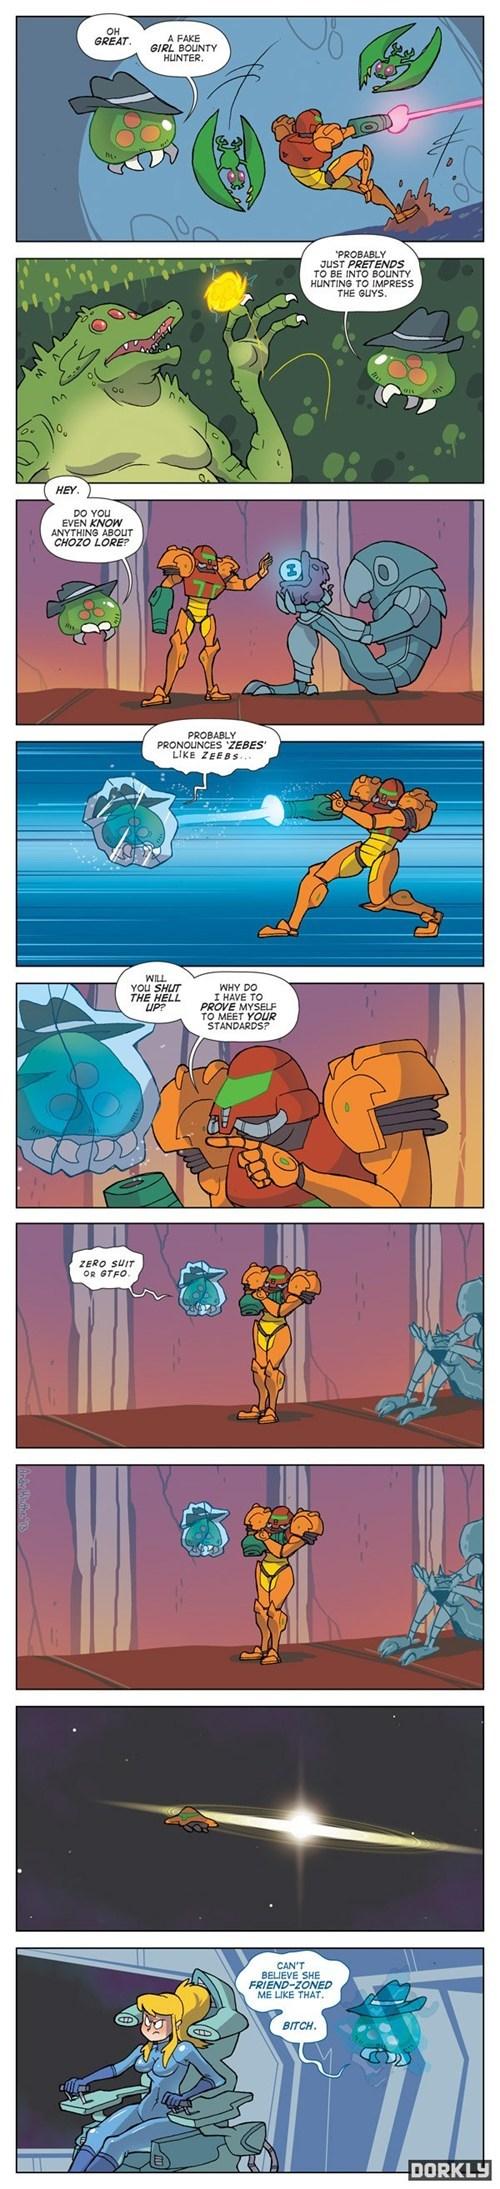 dorkly,Metroid,comics,samus aran